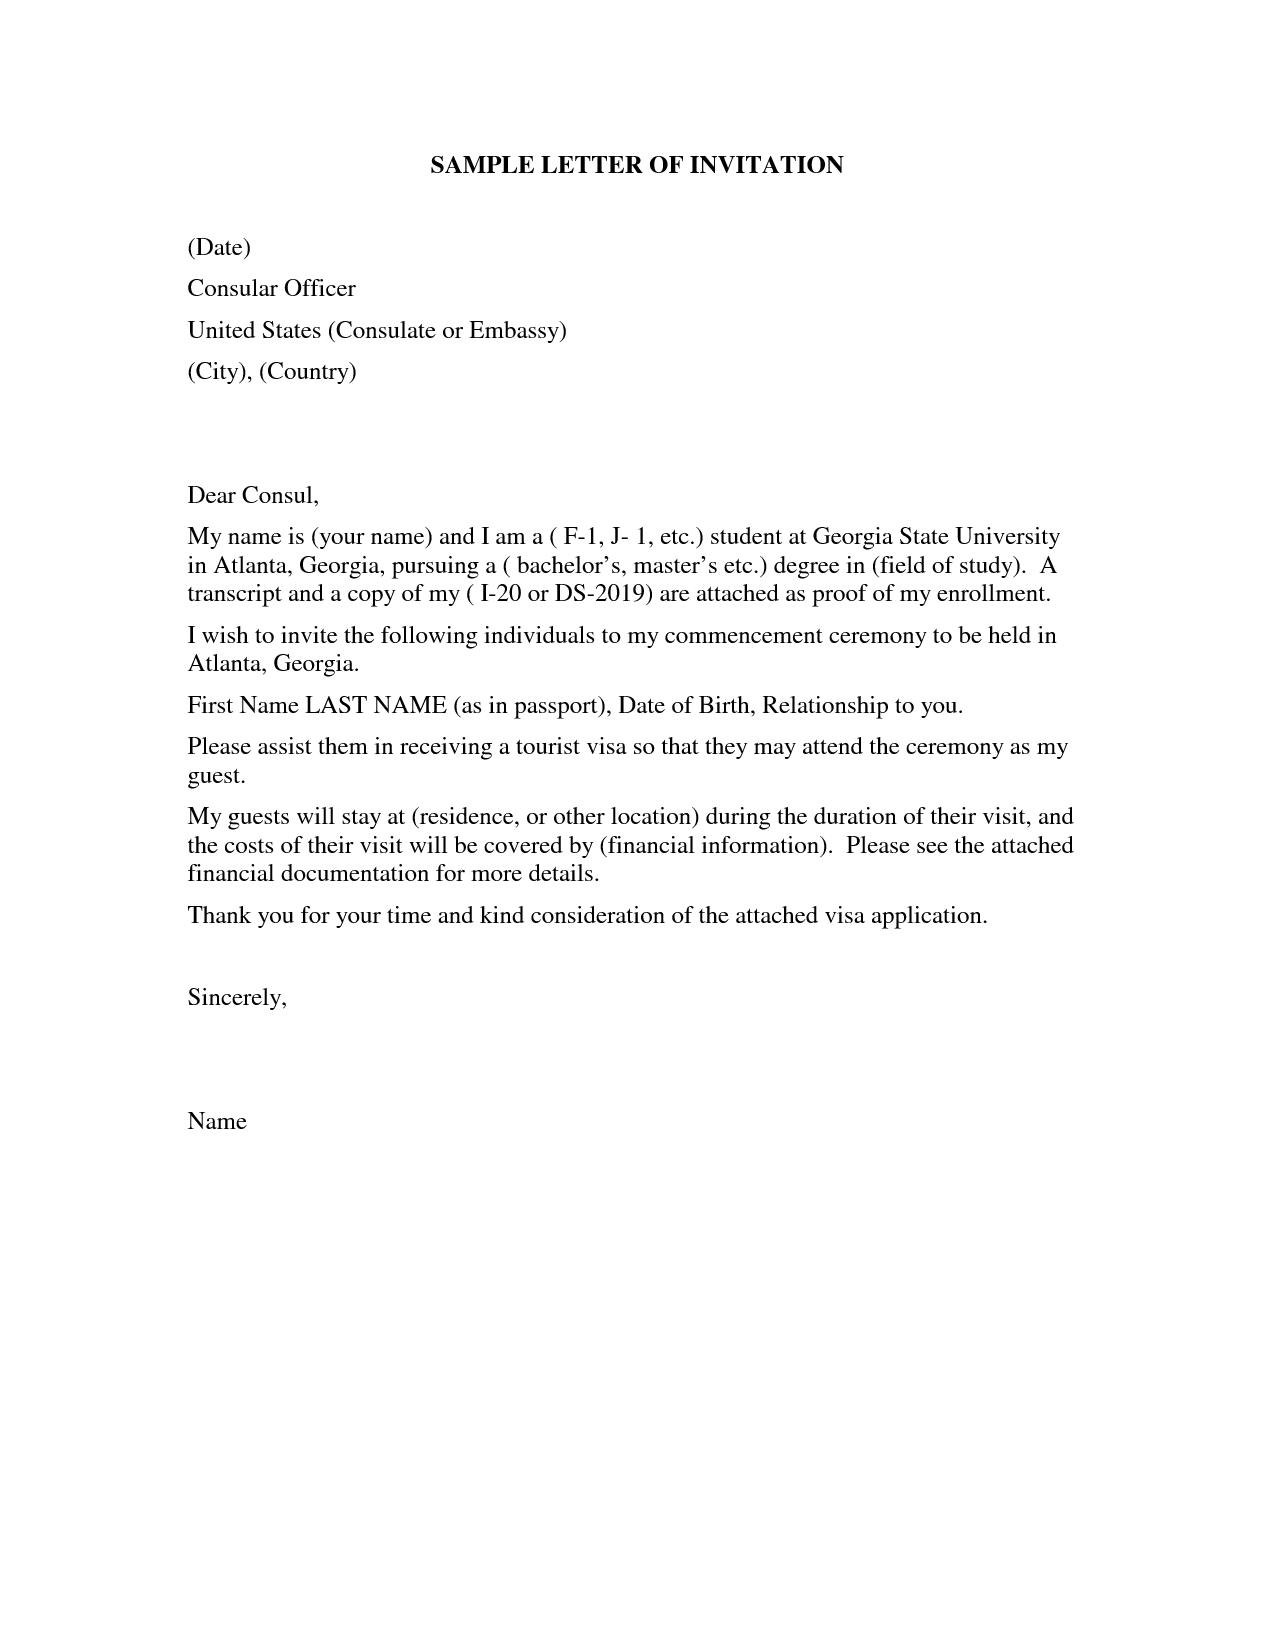 United States Visitor Visa Letter | SAMPLE LETTER OF INVITATION